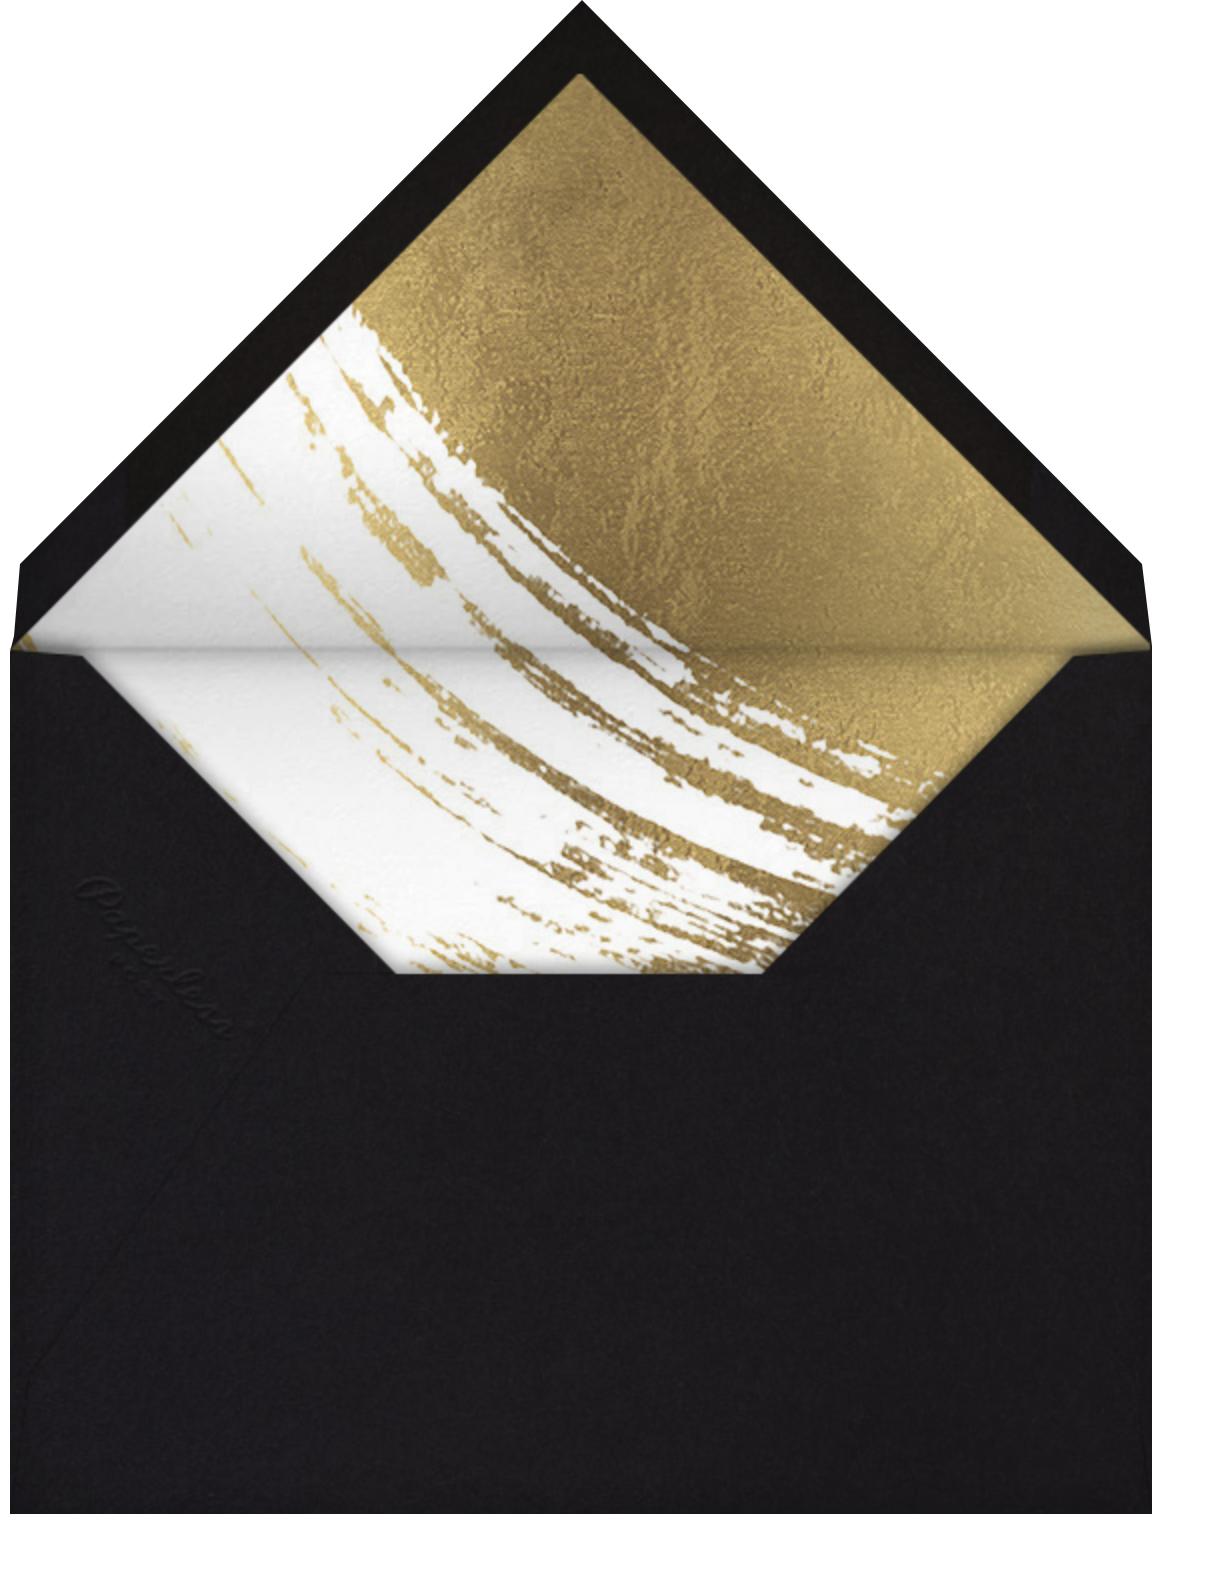 Impasto - Gold - Paperless Post - General entertaining - envelope back